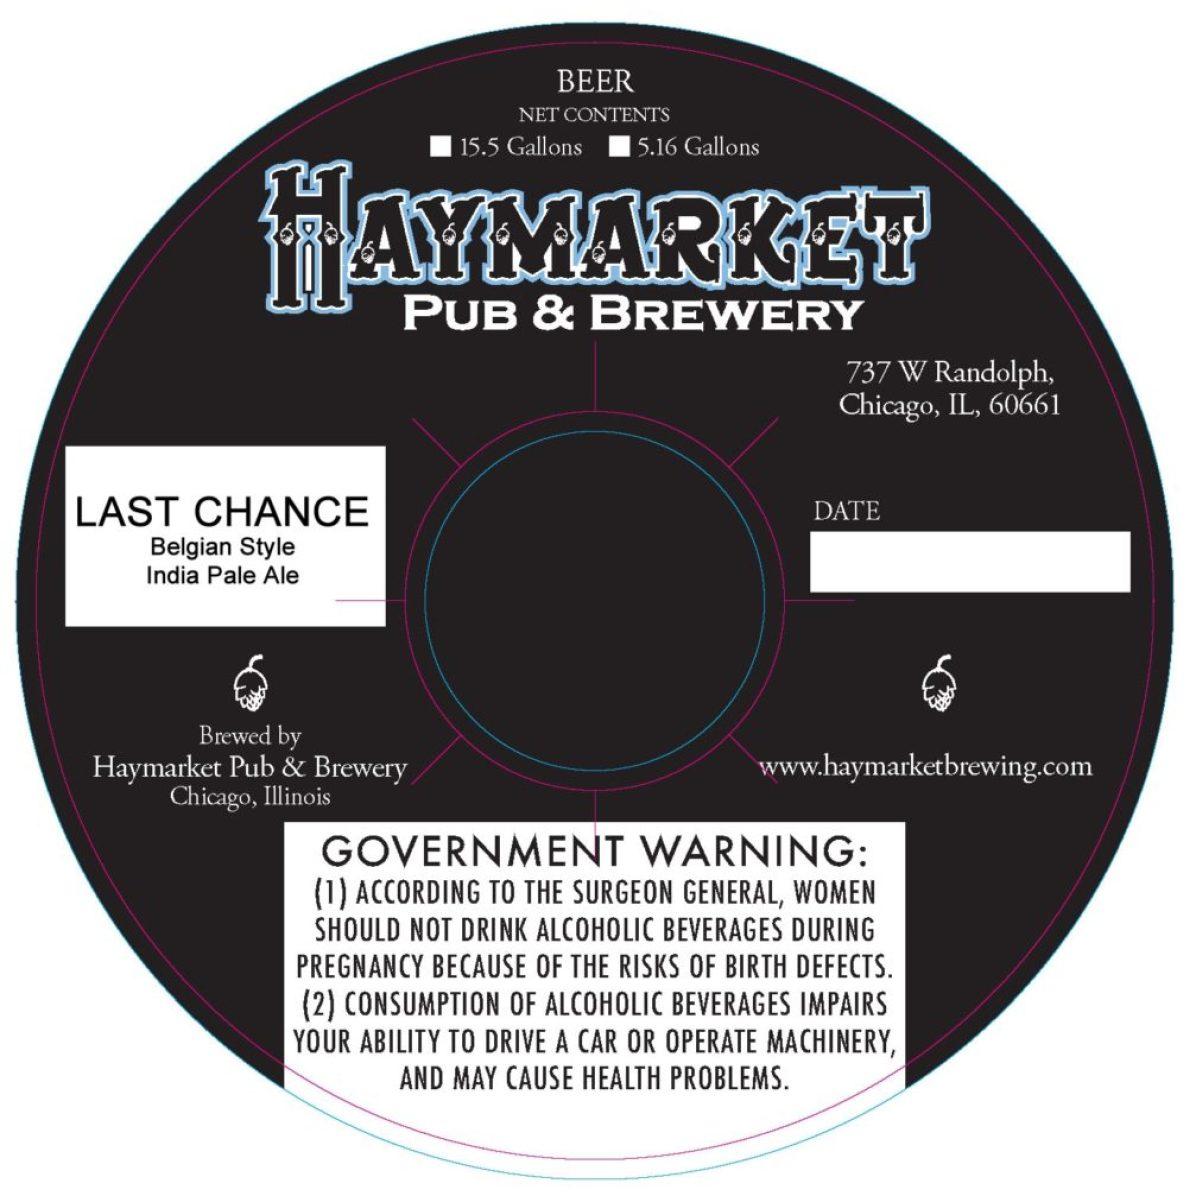 Haymarket Last Chance Belgian Style India Pale Ale